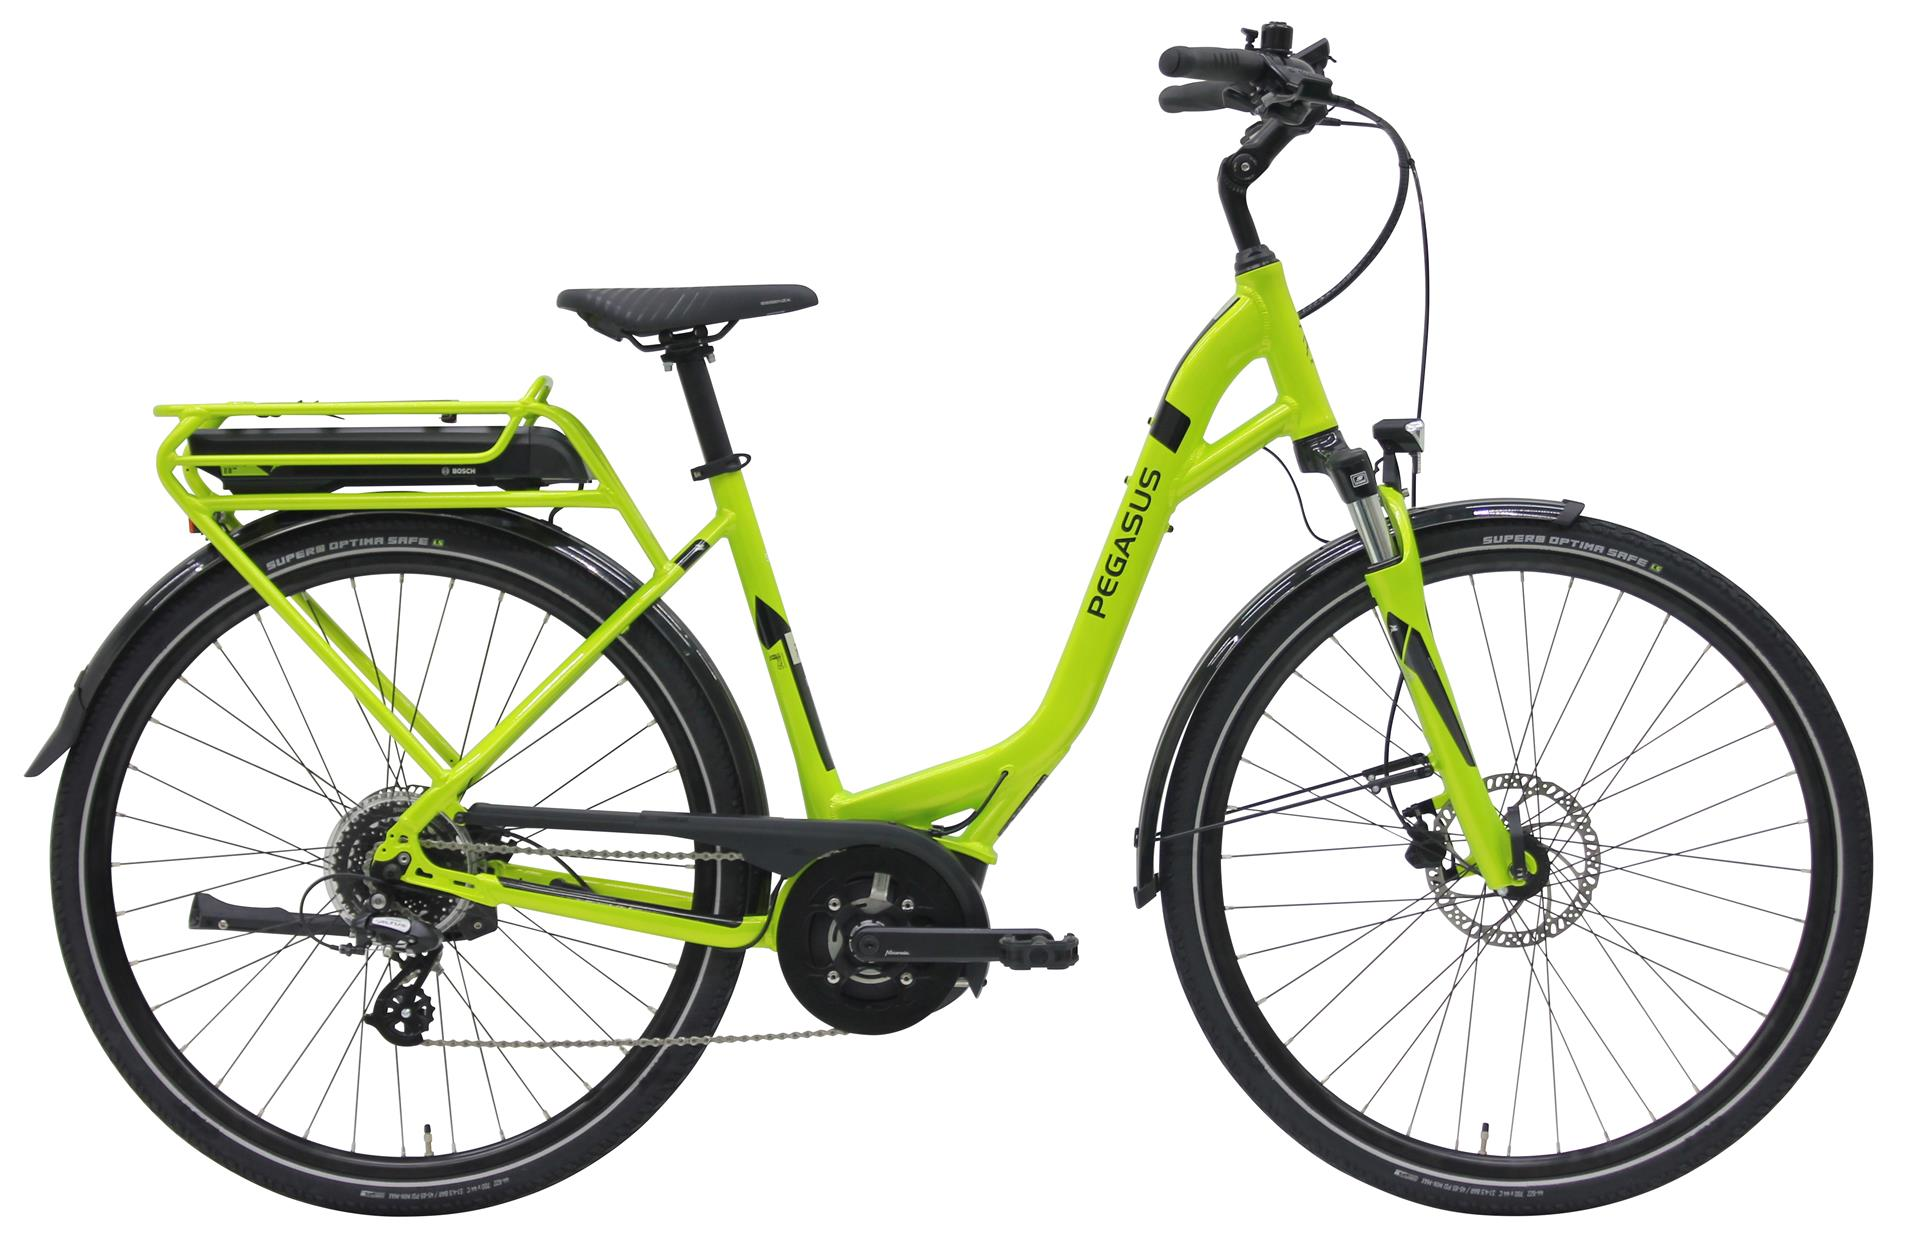 pegasus solero e8 11 ah damen lime 2019 e bikes damen. Black Bedroom Furniture Sets. Home Design Ideas